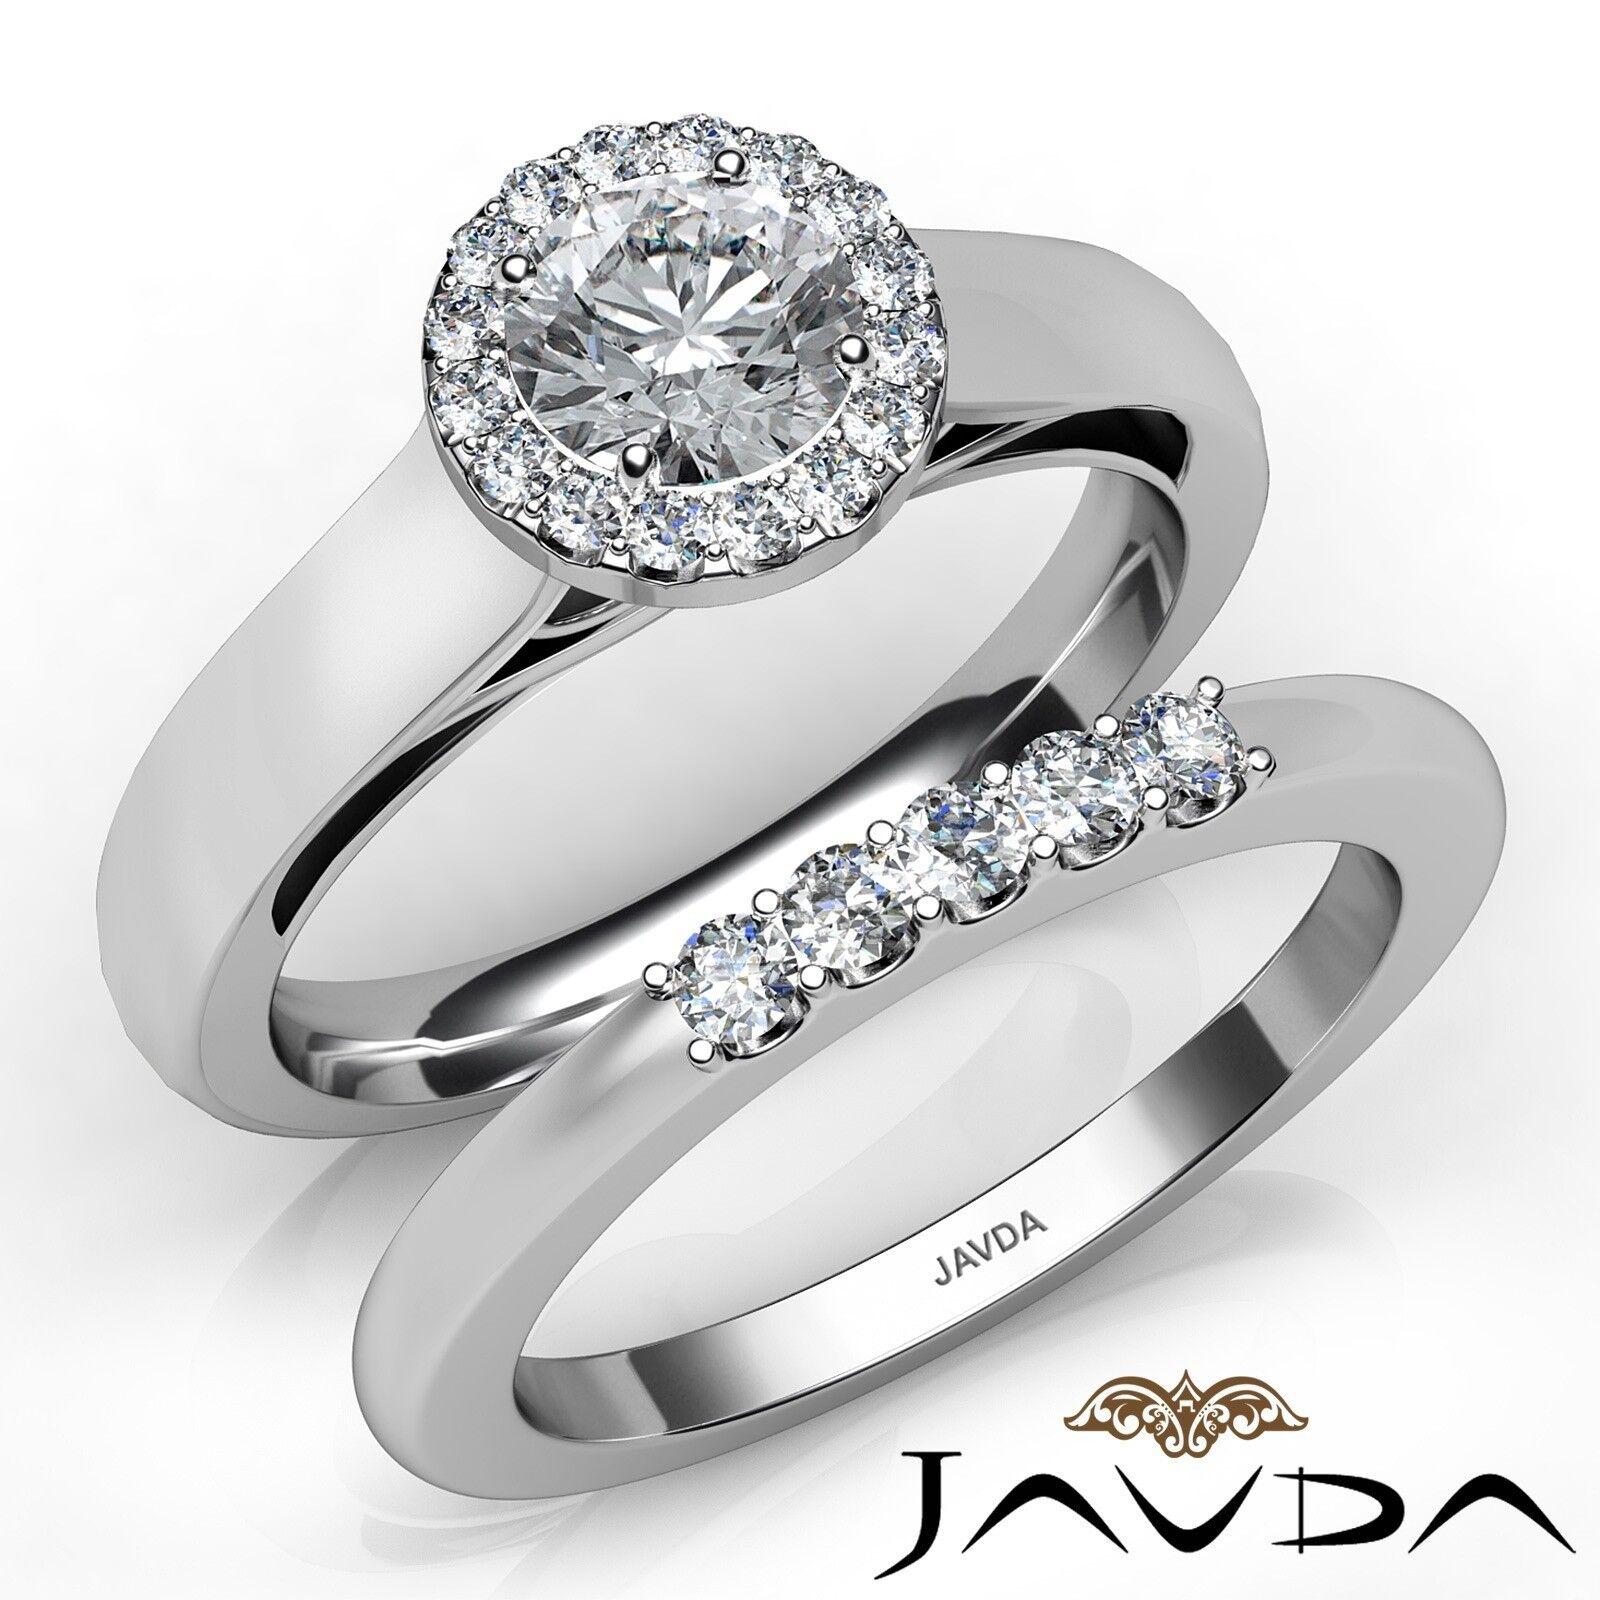 0.9ctw U Prong Halo Bridal Round Diamond Engagement Ring GIA F-VS2 White Gold